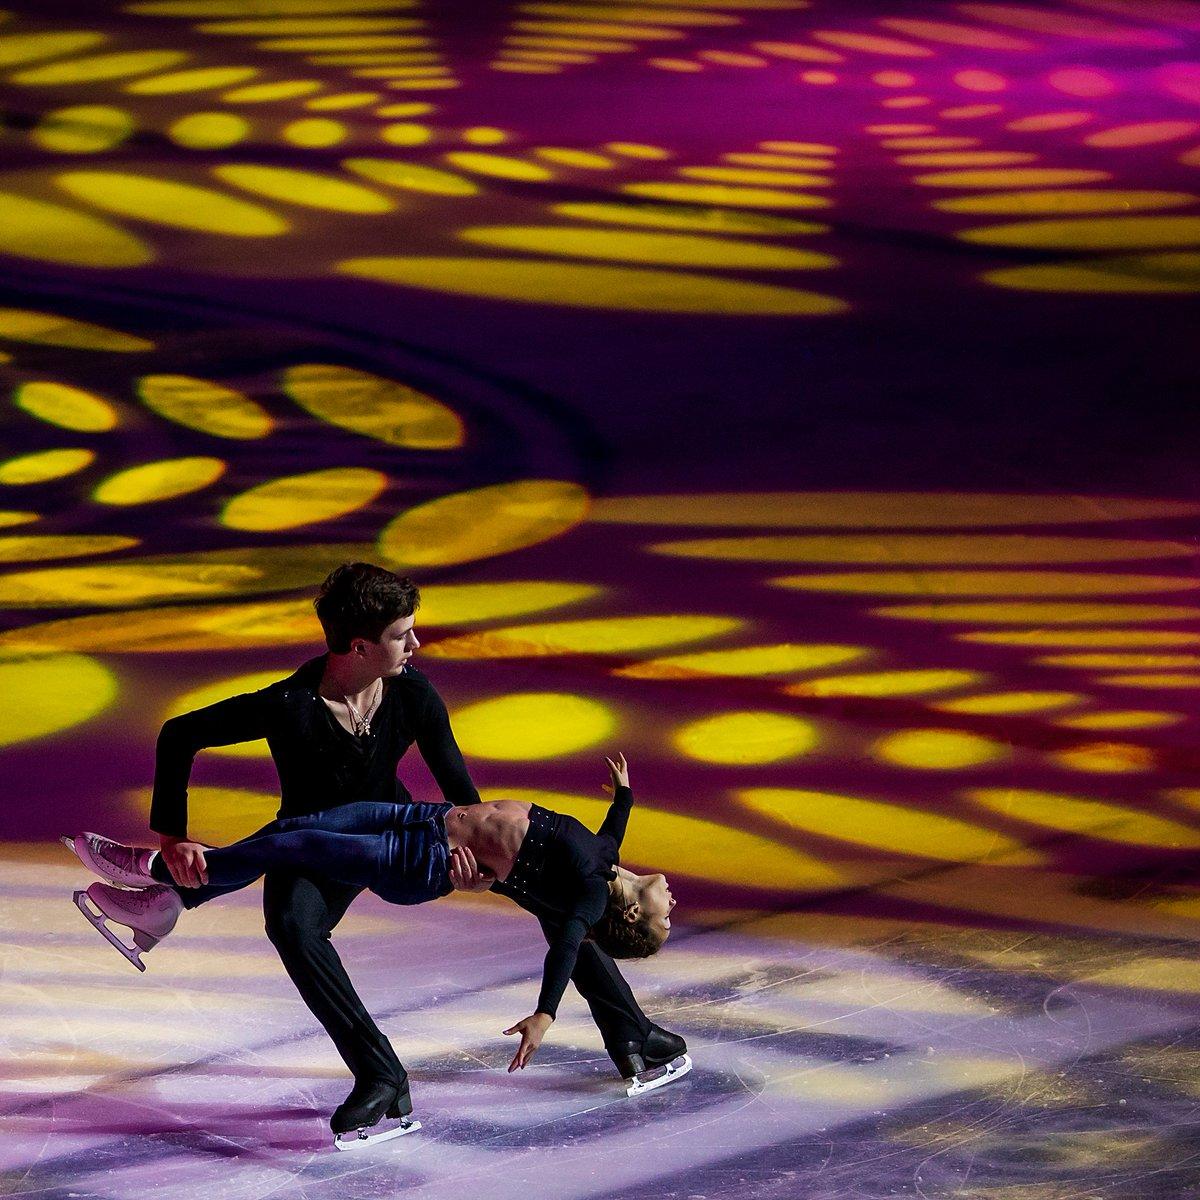 Чемпионат Европы-2019, Минск/Беларусь (21-27 января) Dks6_daW0AAV8-y